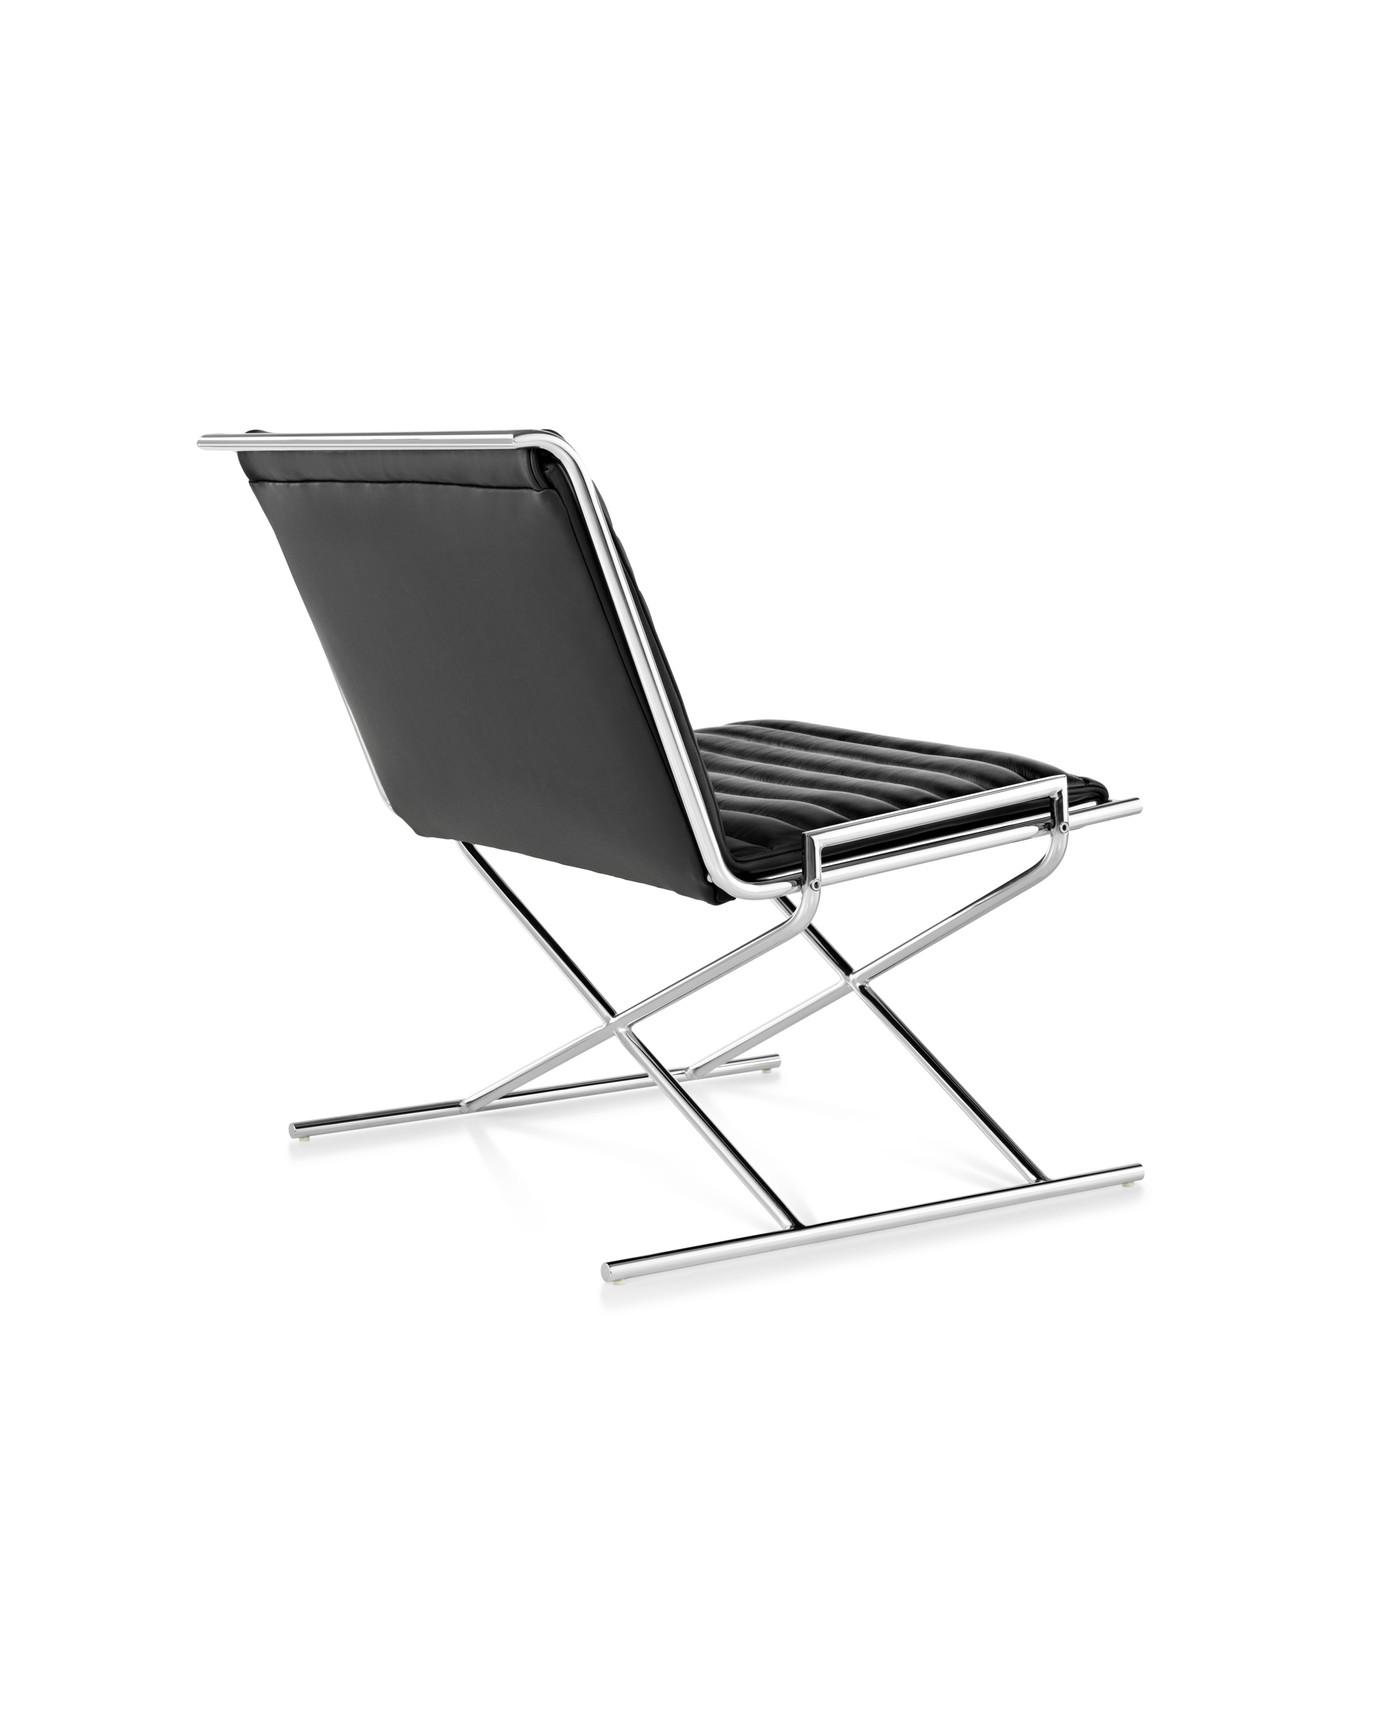 1-Silla-Lounge-Sled-Hero-1380